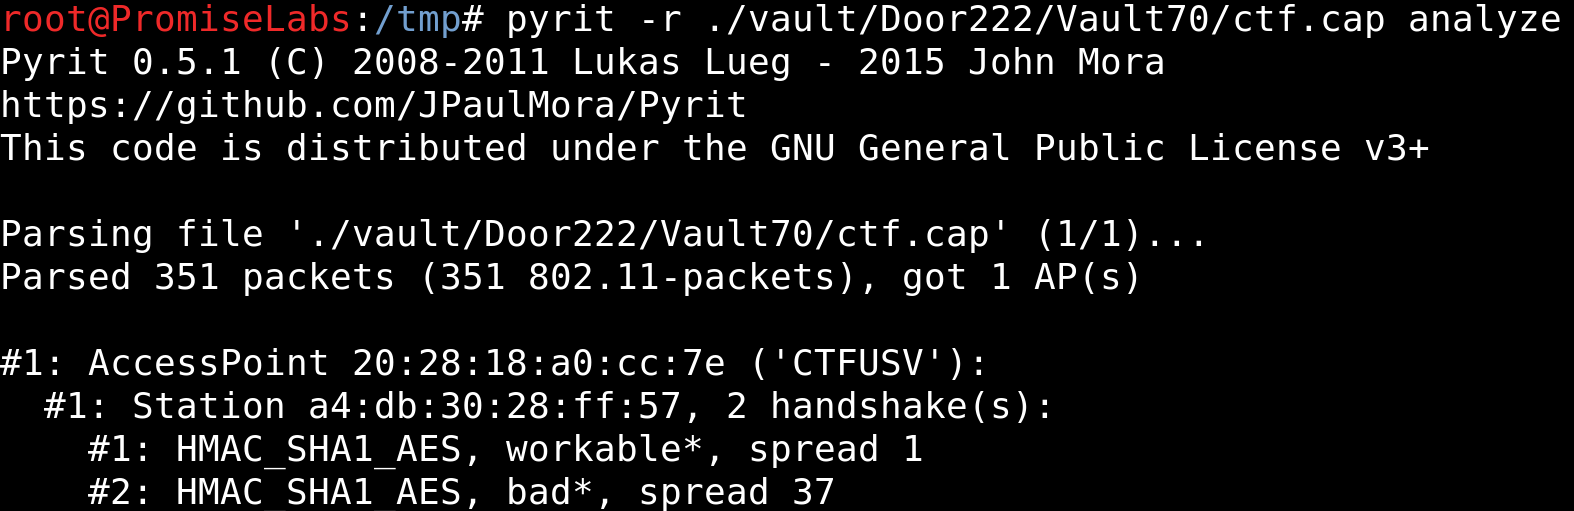 # pyrit -r ./vault/Door222/Vault70/ctf.cap analyze